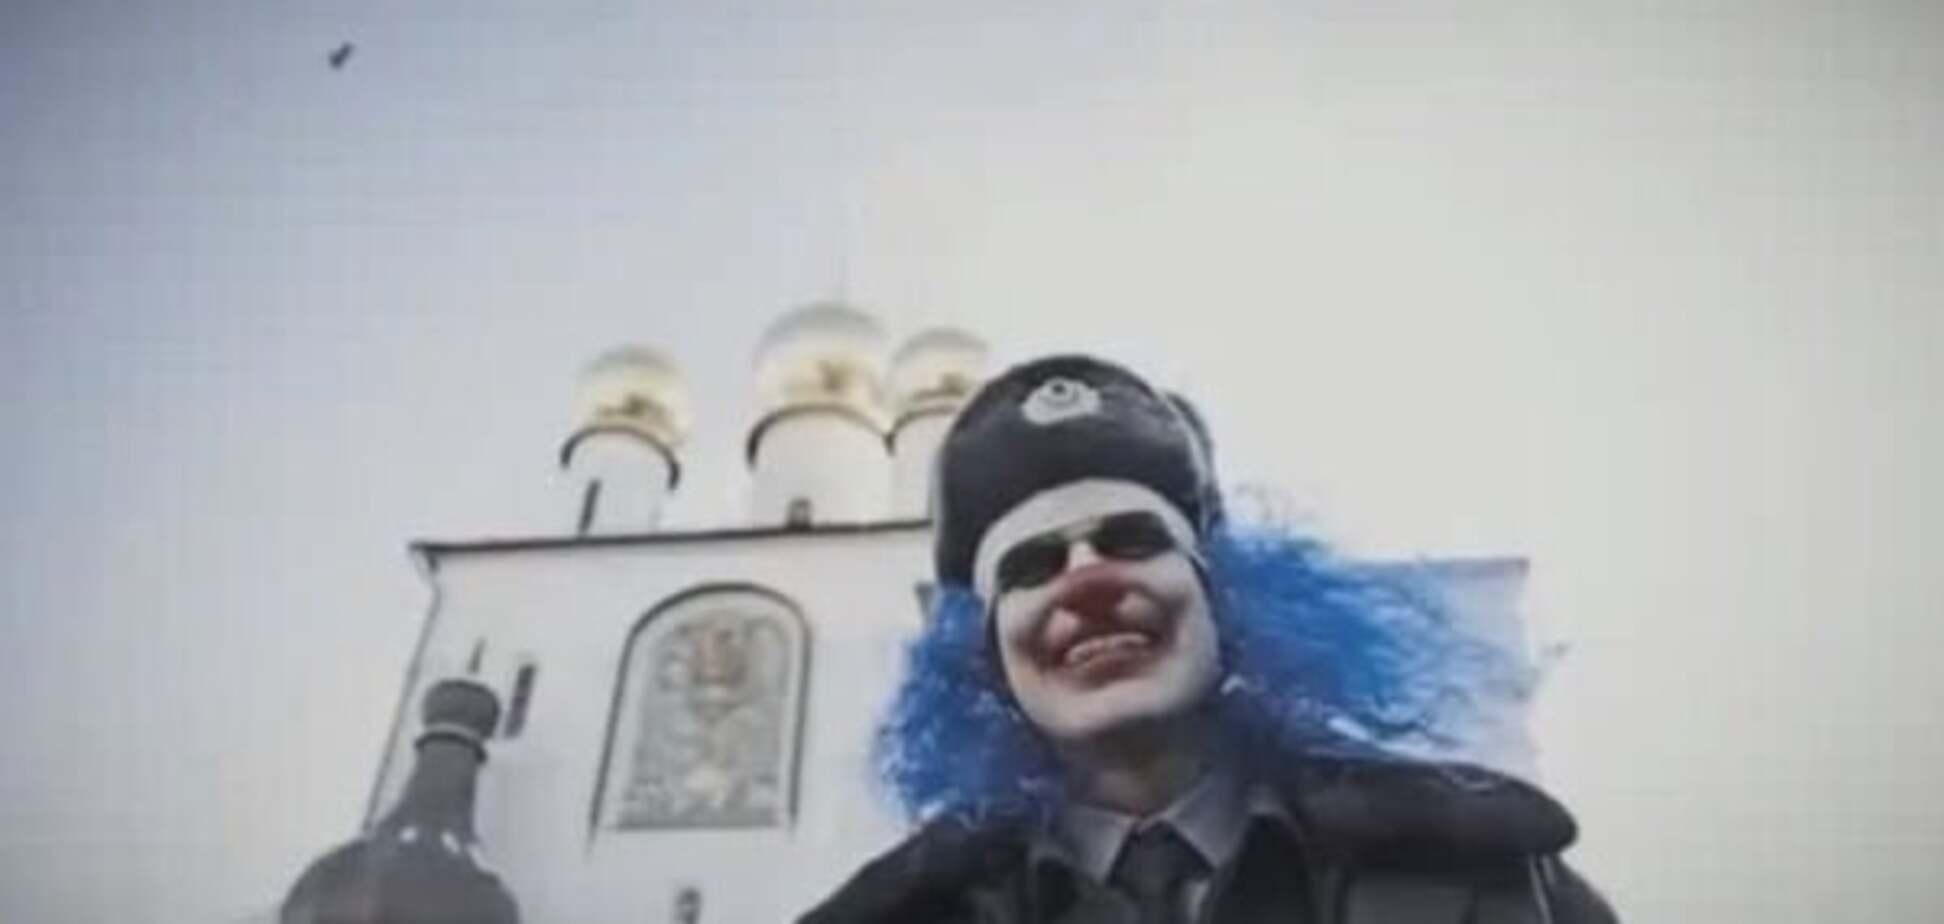 Жити стало веселіше: Москва проведе в Донецьку фестиваль клоунів